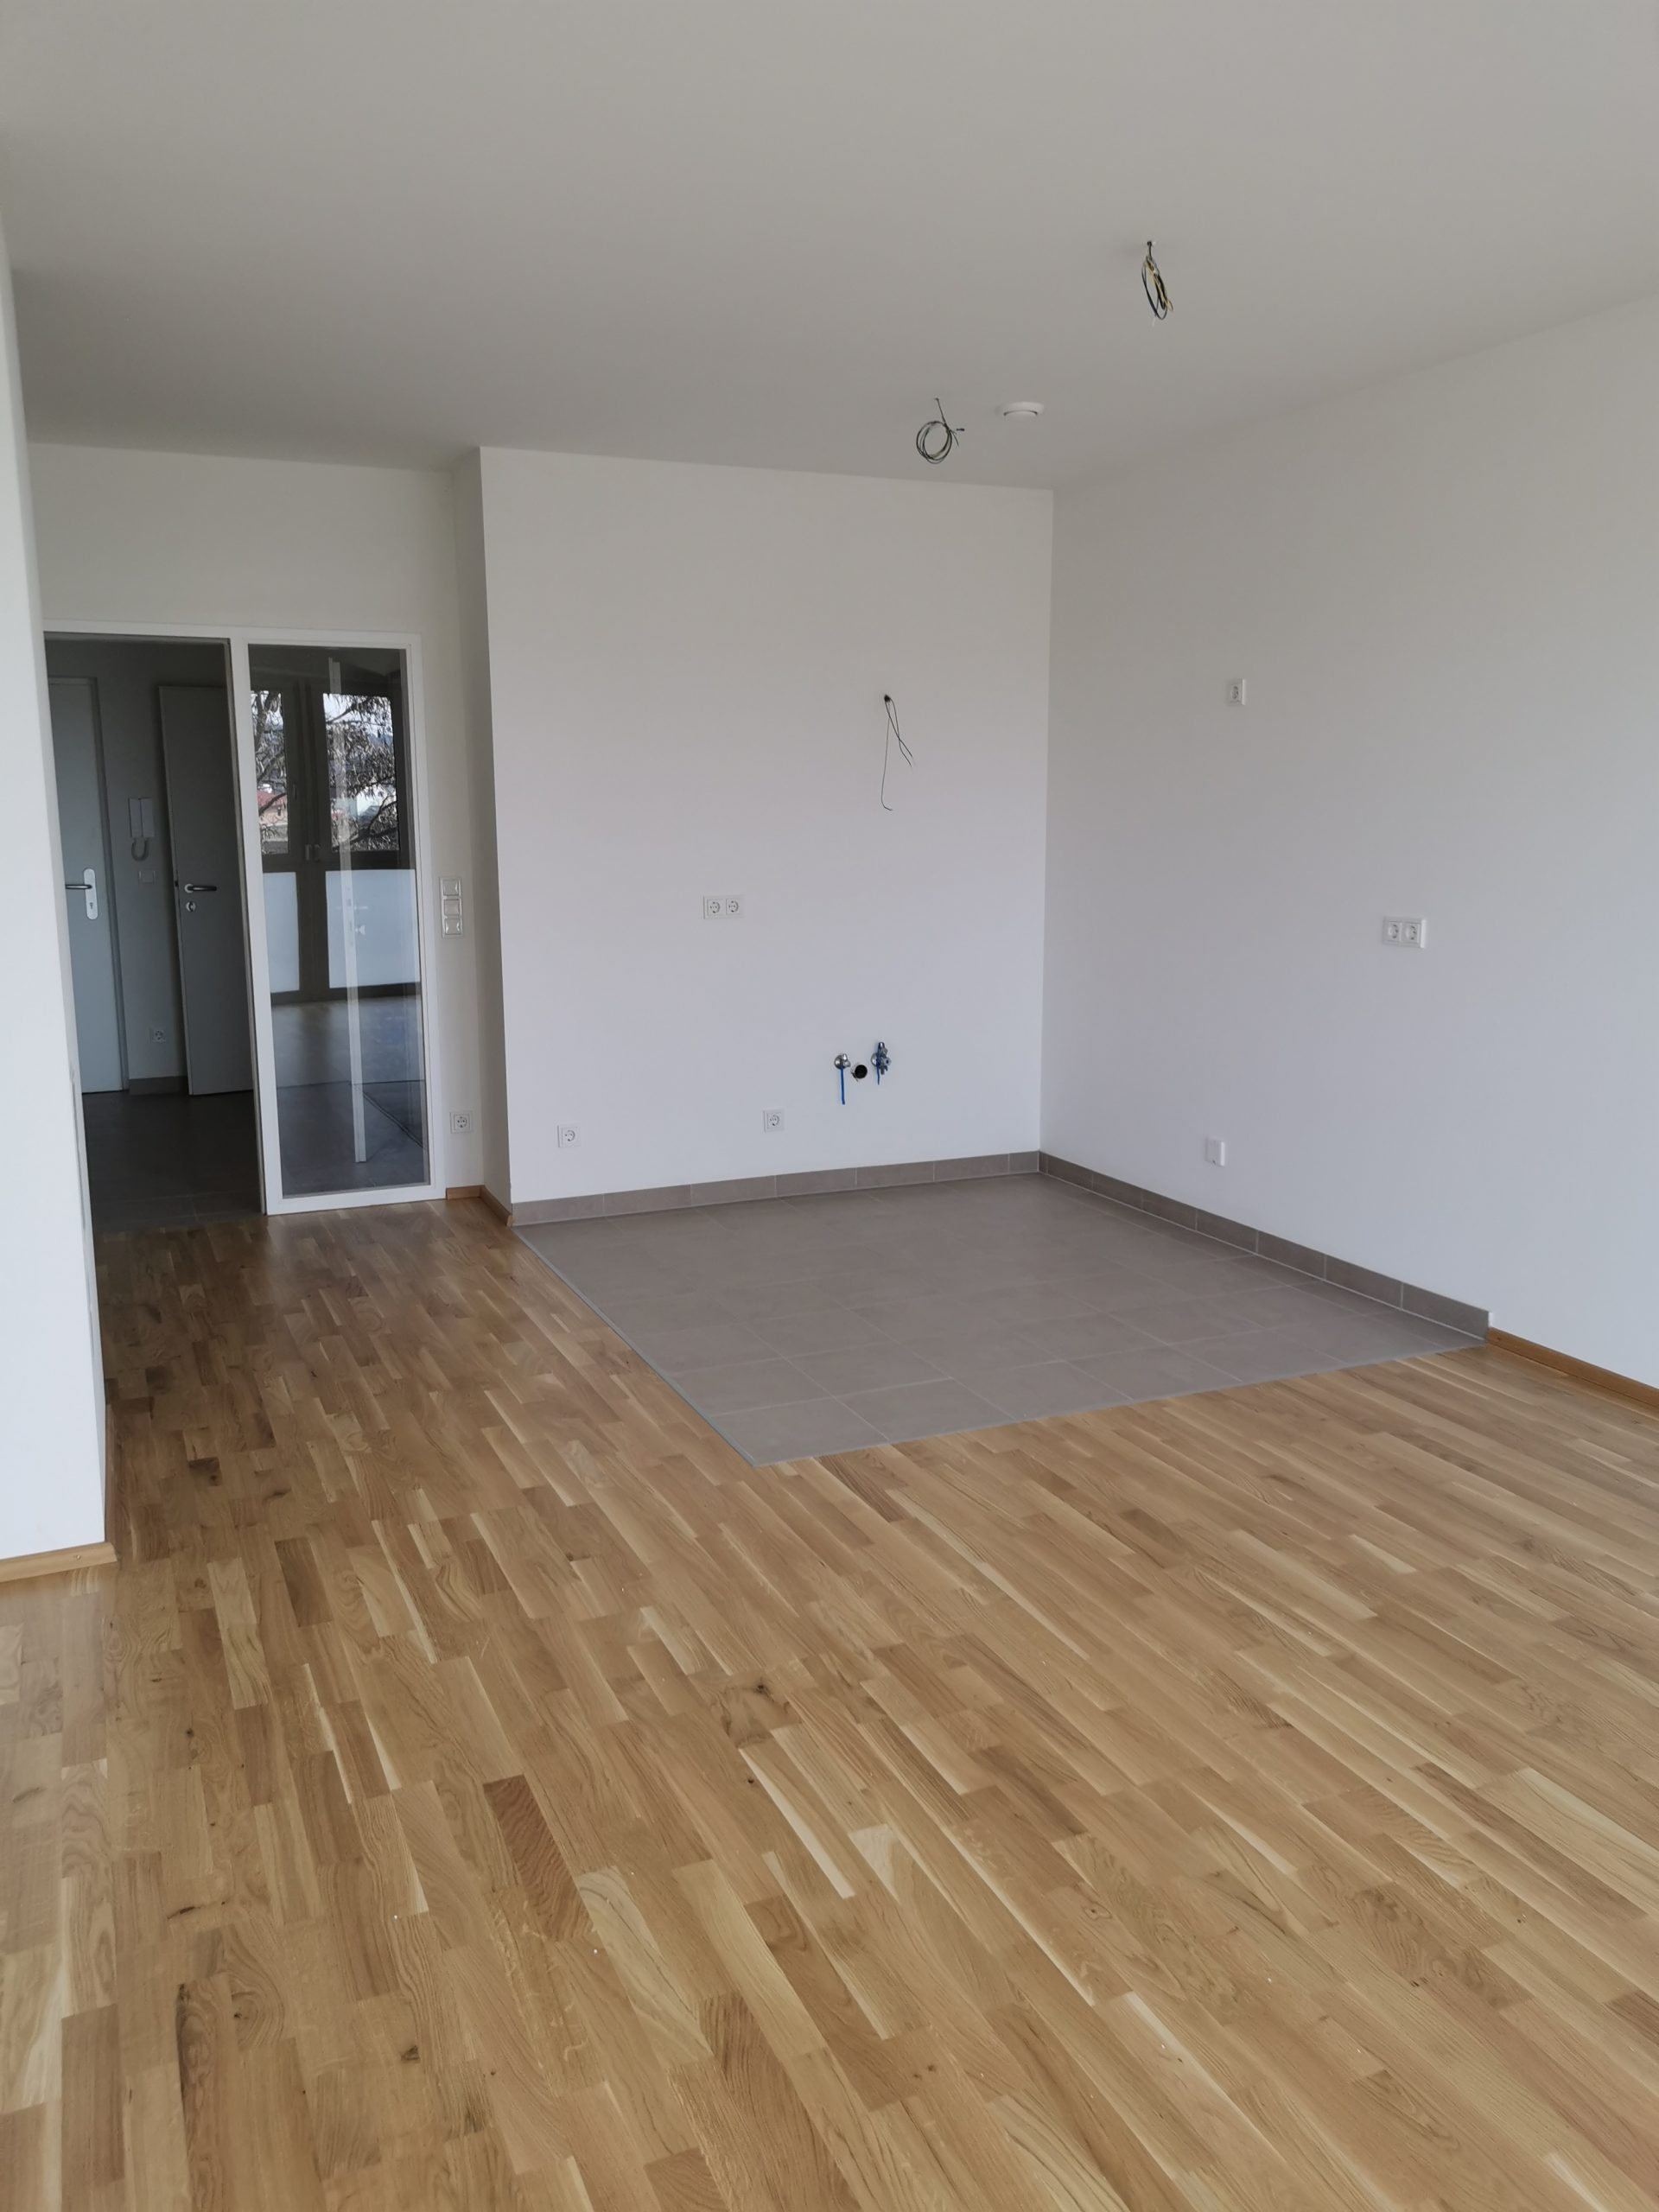 Immobilie von Kamptal in 3730 Eggenburg, Horn, Eggenburg VII - Top 106 #1